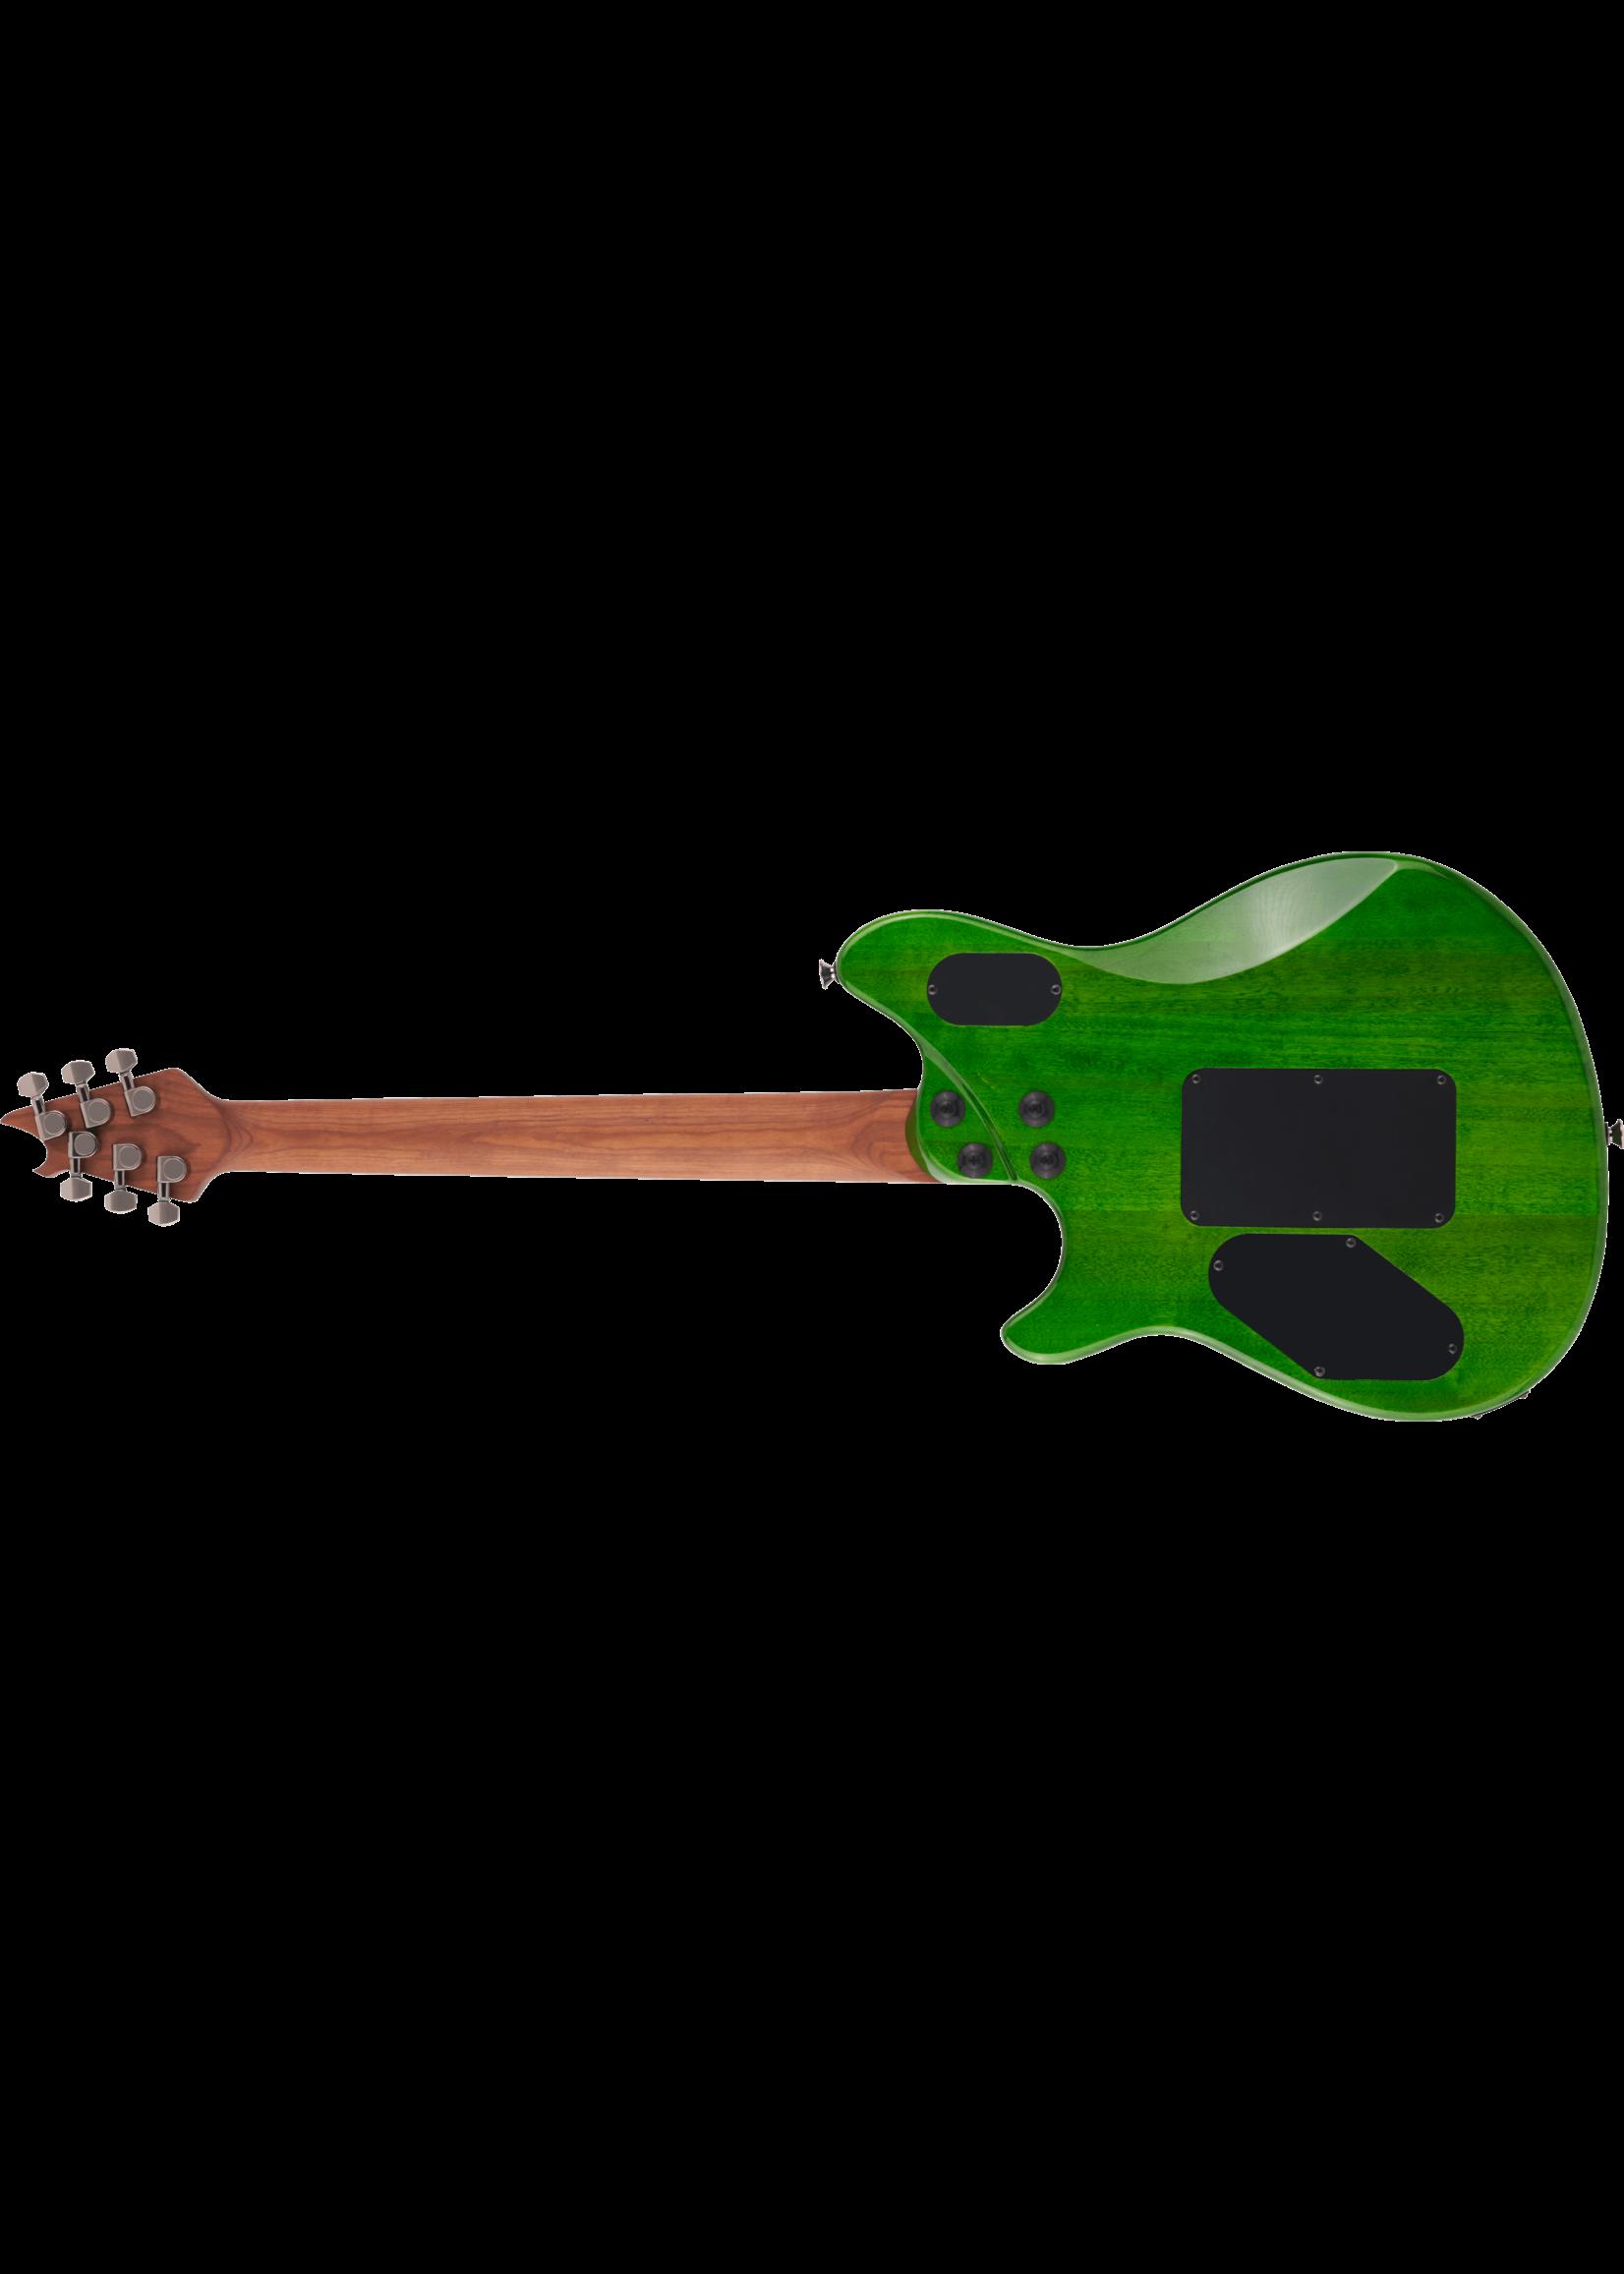 EVH EVH Wolfgang WG Standard QM with Baked Maple Fretboard Transparent Green